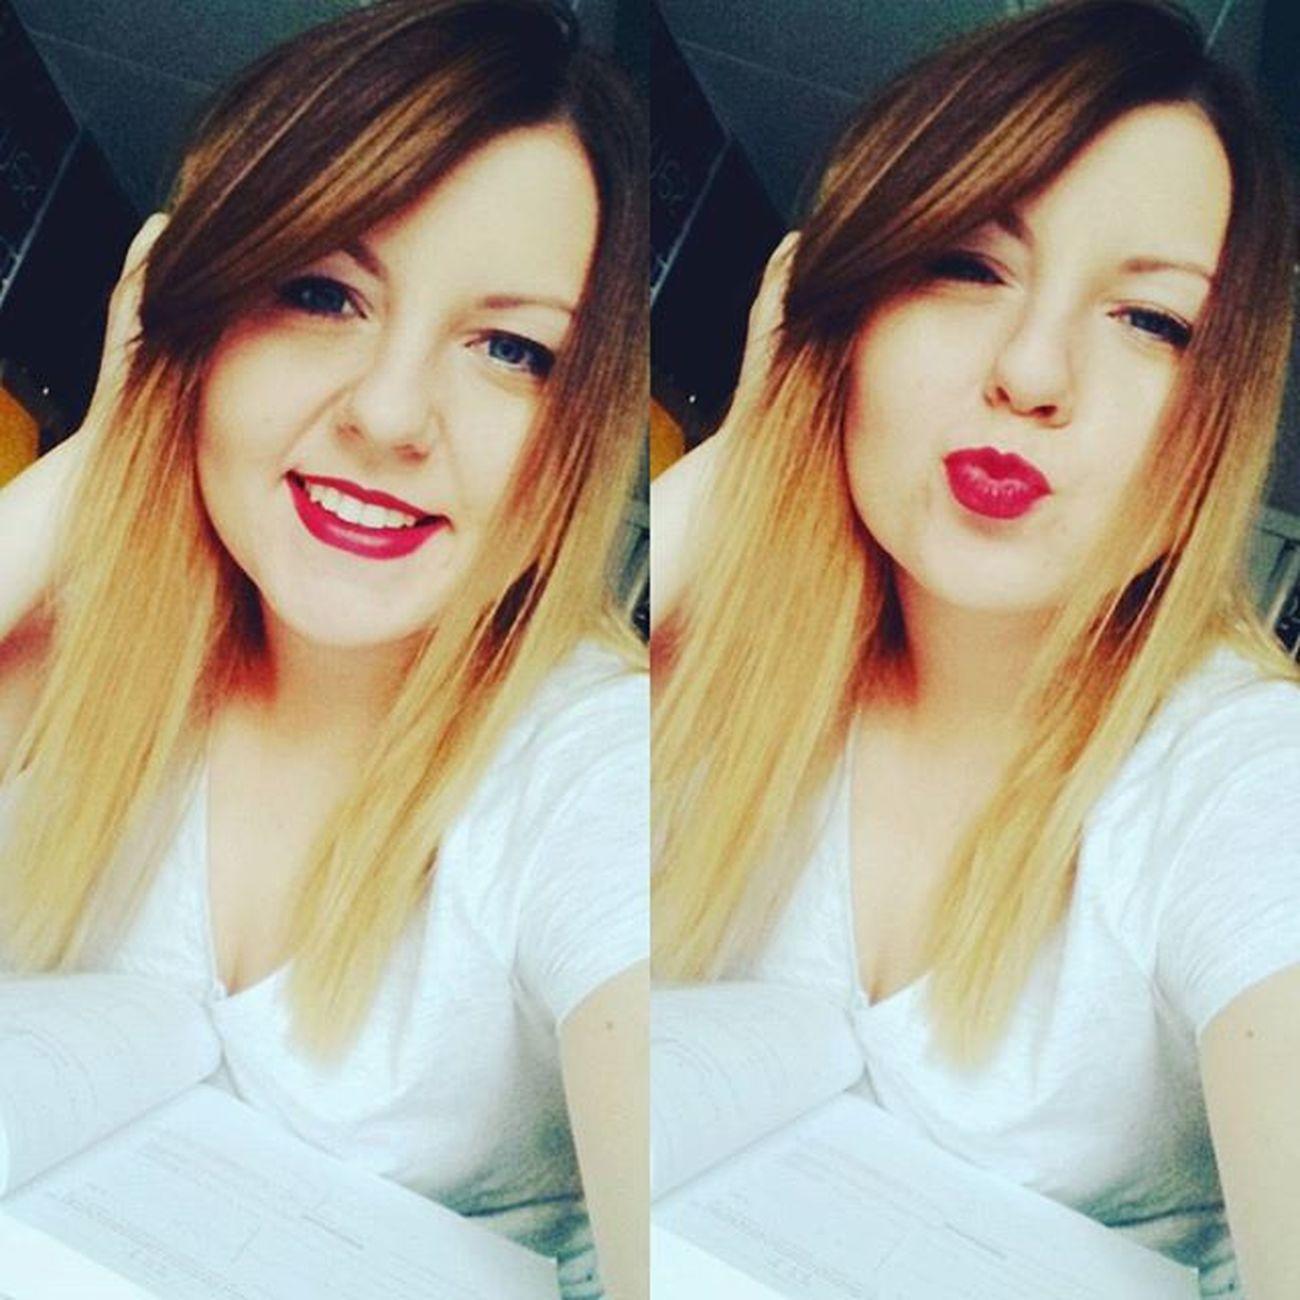 Chcesz być inżynierem, to płacz 😢 Math Study Whatthehellwrongwithme Polishgirl Today Kisses Smile Selfie Ombre Goldenrose Thanks  For New Lipcrayon 😍😍😍 Polishgirlsdoitbetter Beauty 😵😵 Changes Bestoftheday Picoftheday Photooftheday Likeforlike Followme